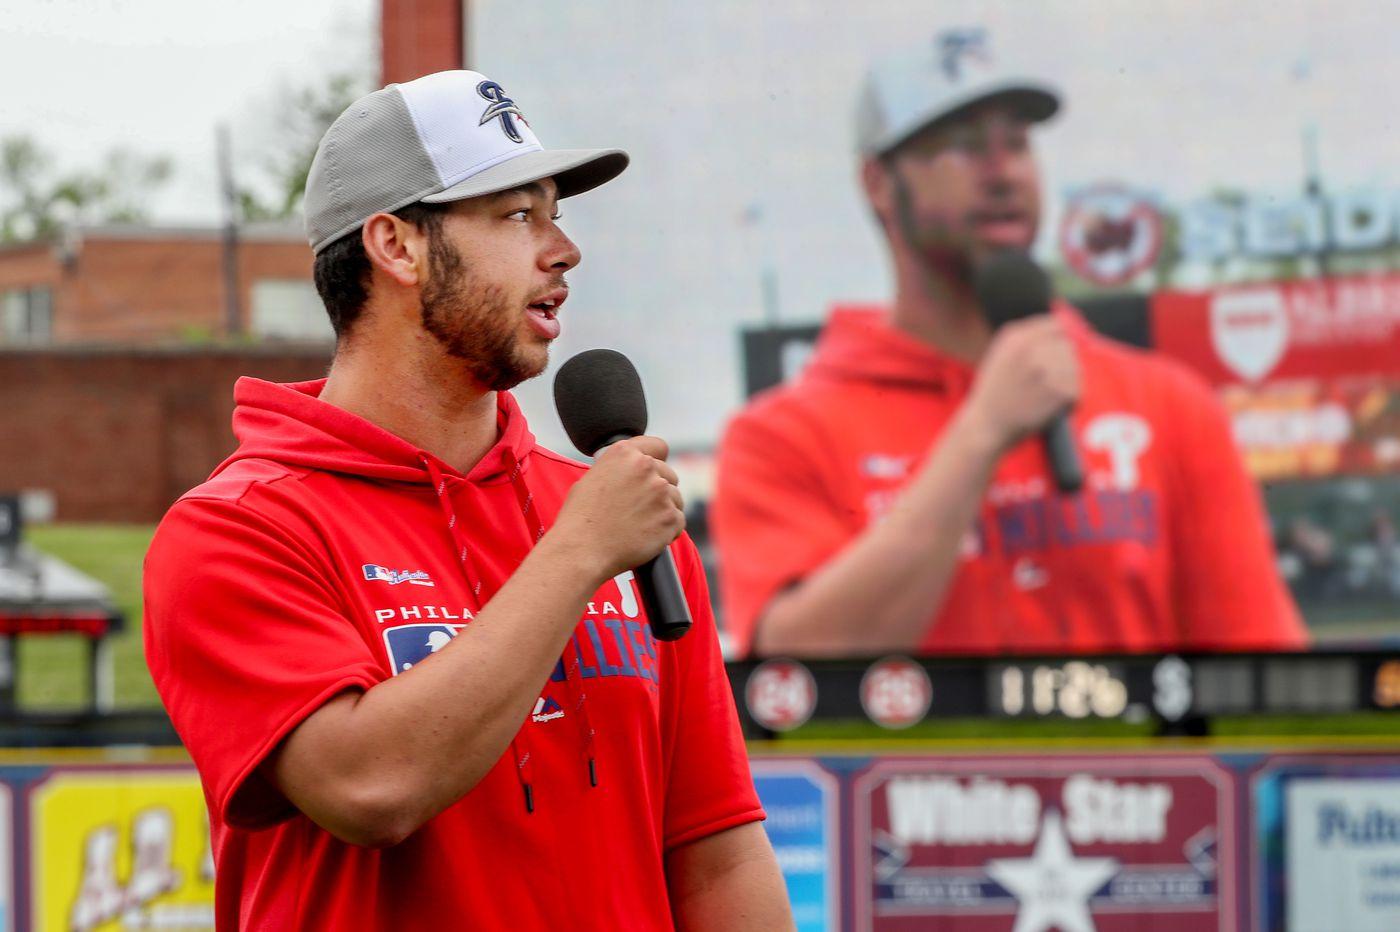 Phillies minor leaguers scrambling to make ends meet during coronavirus shutdown